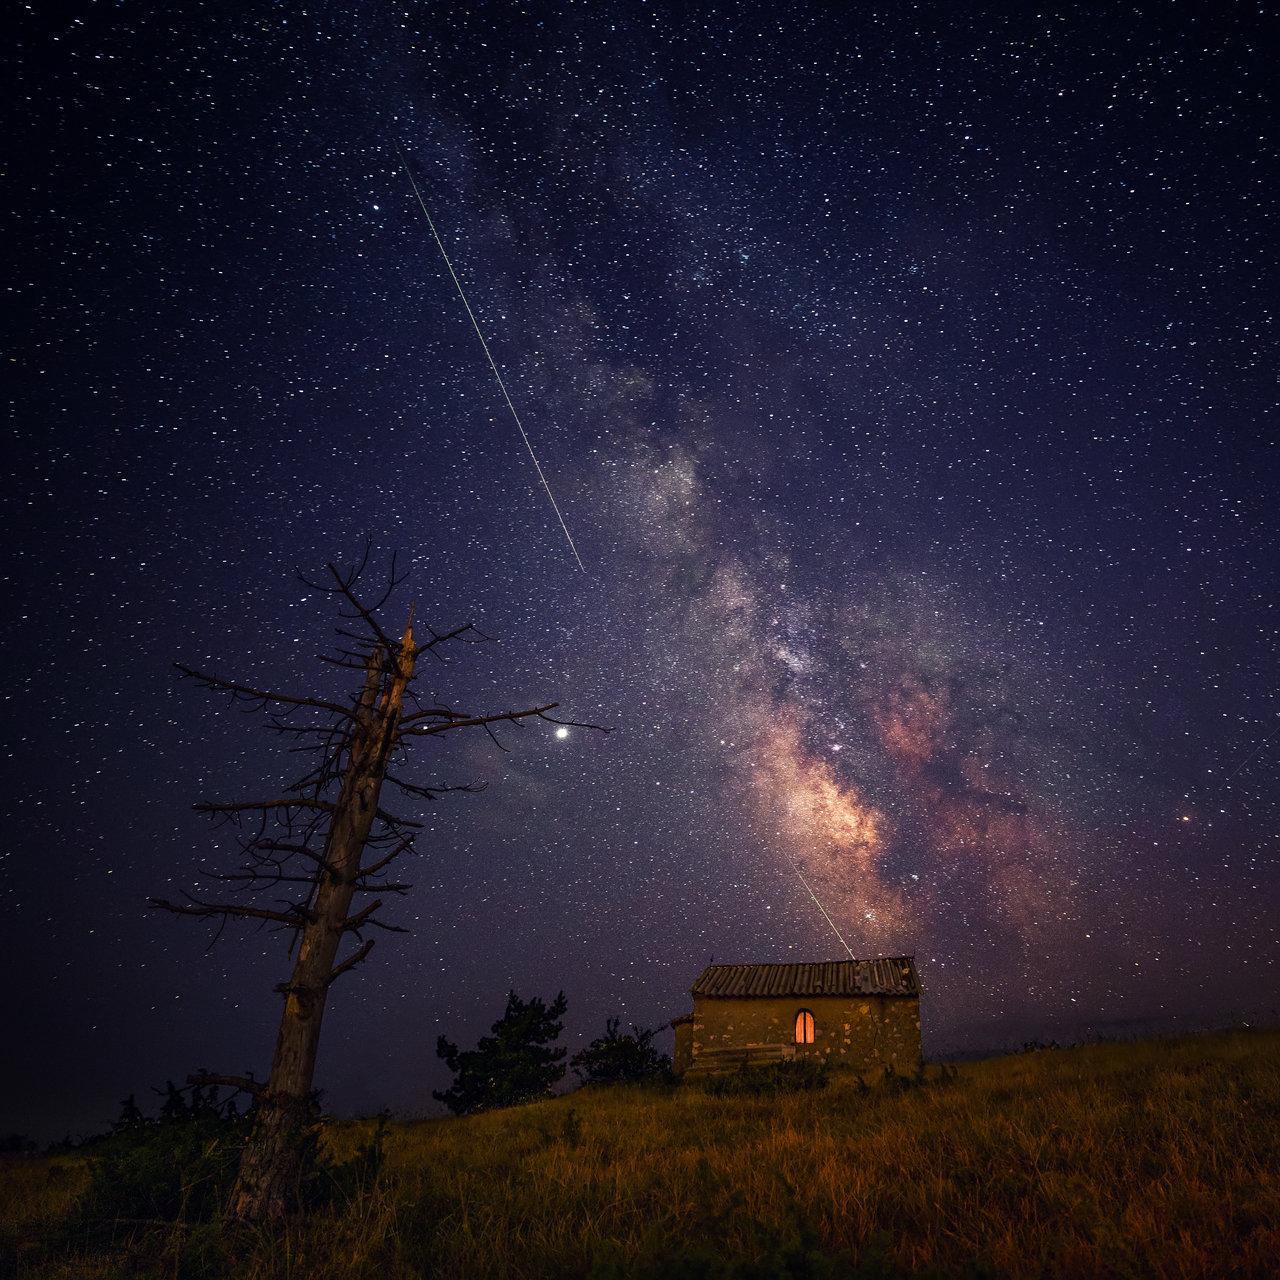 Photo in Astrophotography | Author _koko_ | PHOTO FORUM